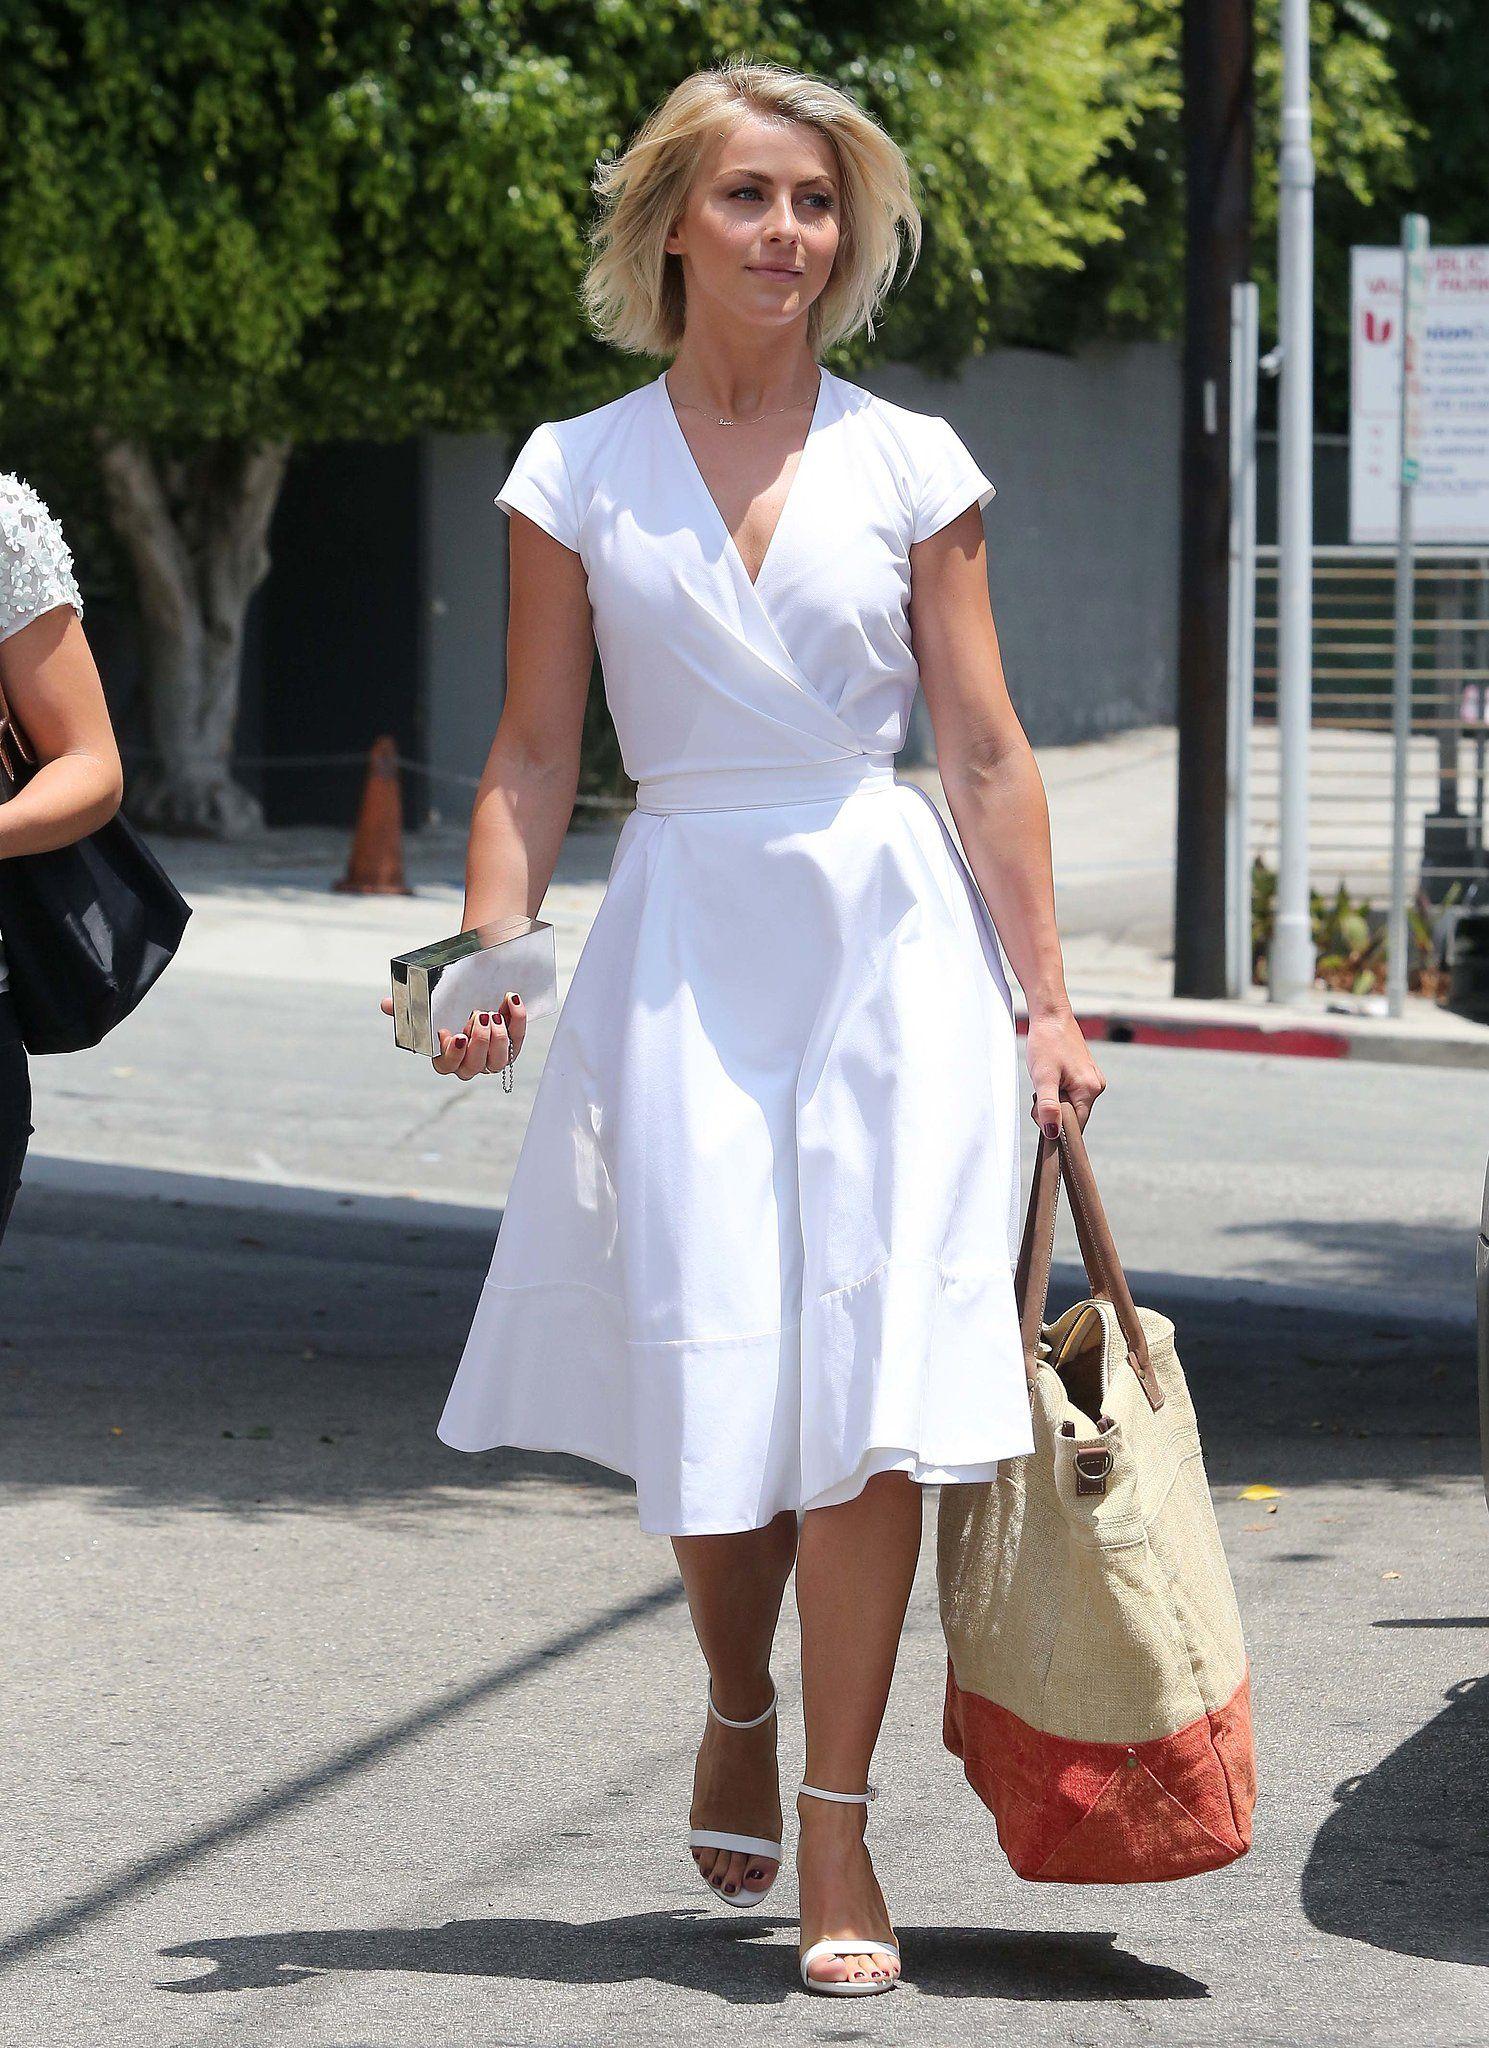 summer-dresses-the-wrap-dress-DVF-style-18 | Wrap | Pinterest ...